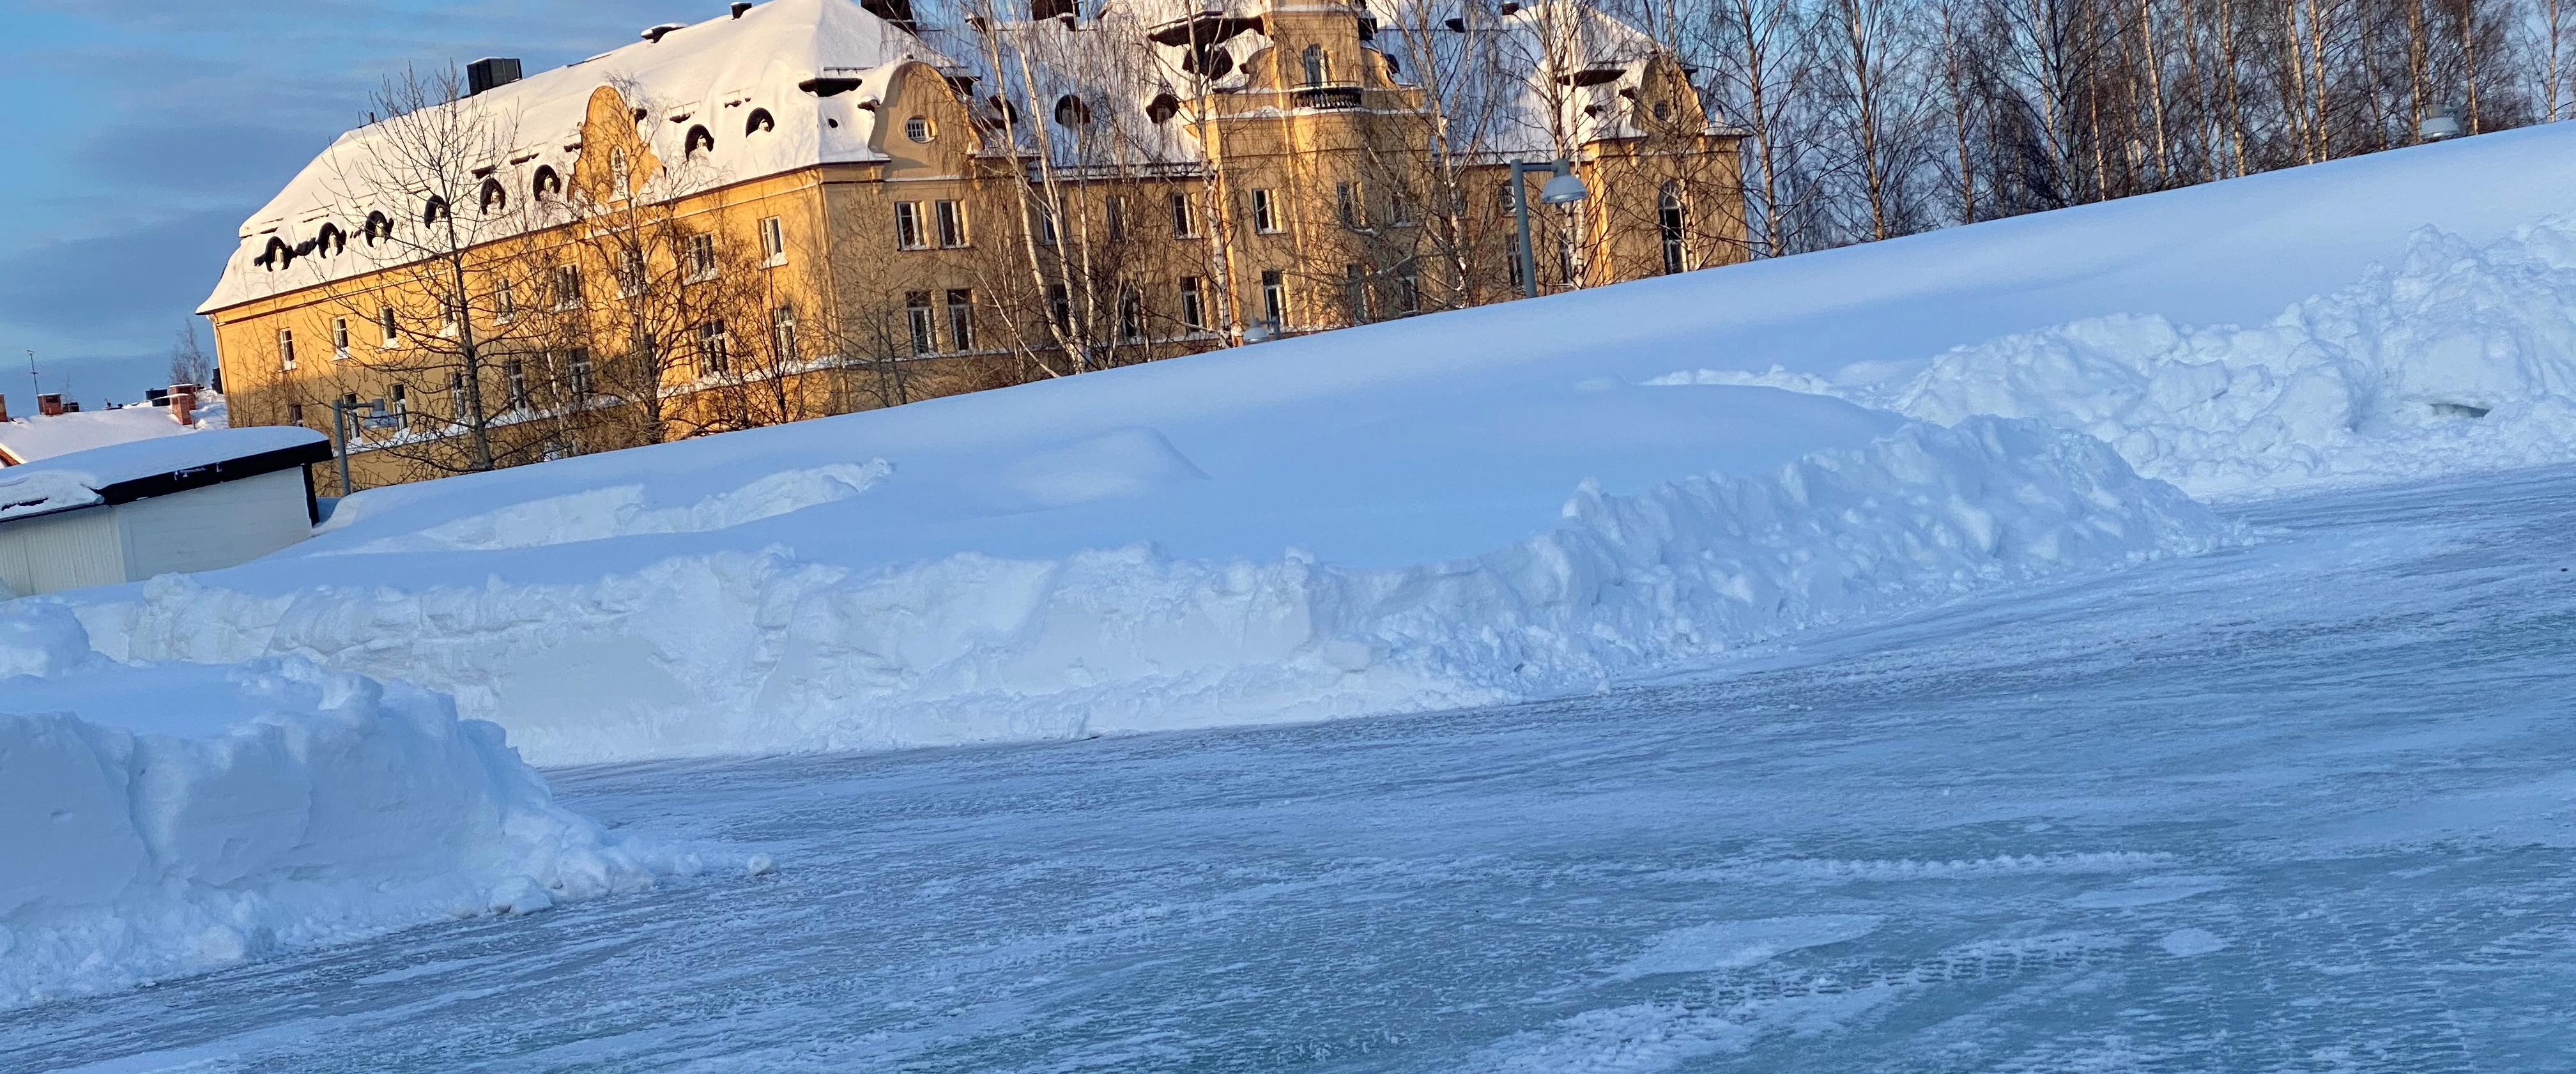 Isbanan med Stadshotellet som utsikt mitt i Piteå